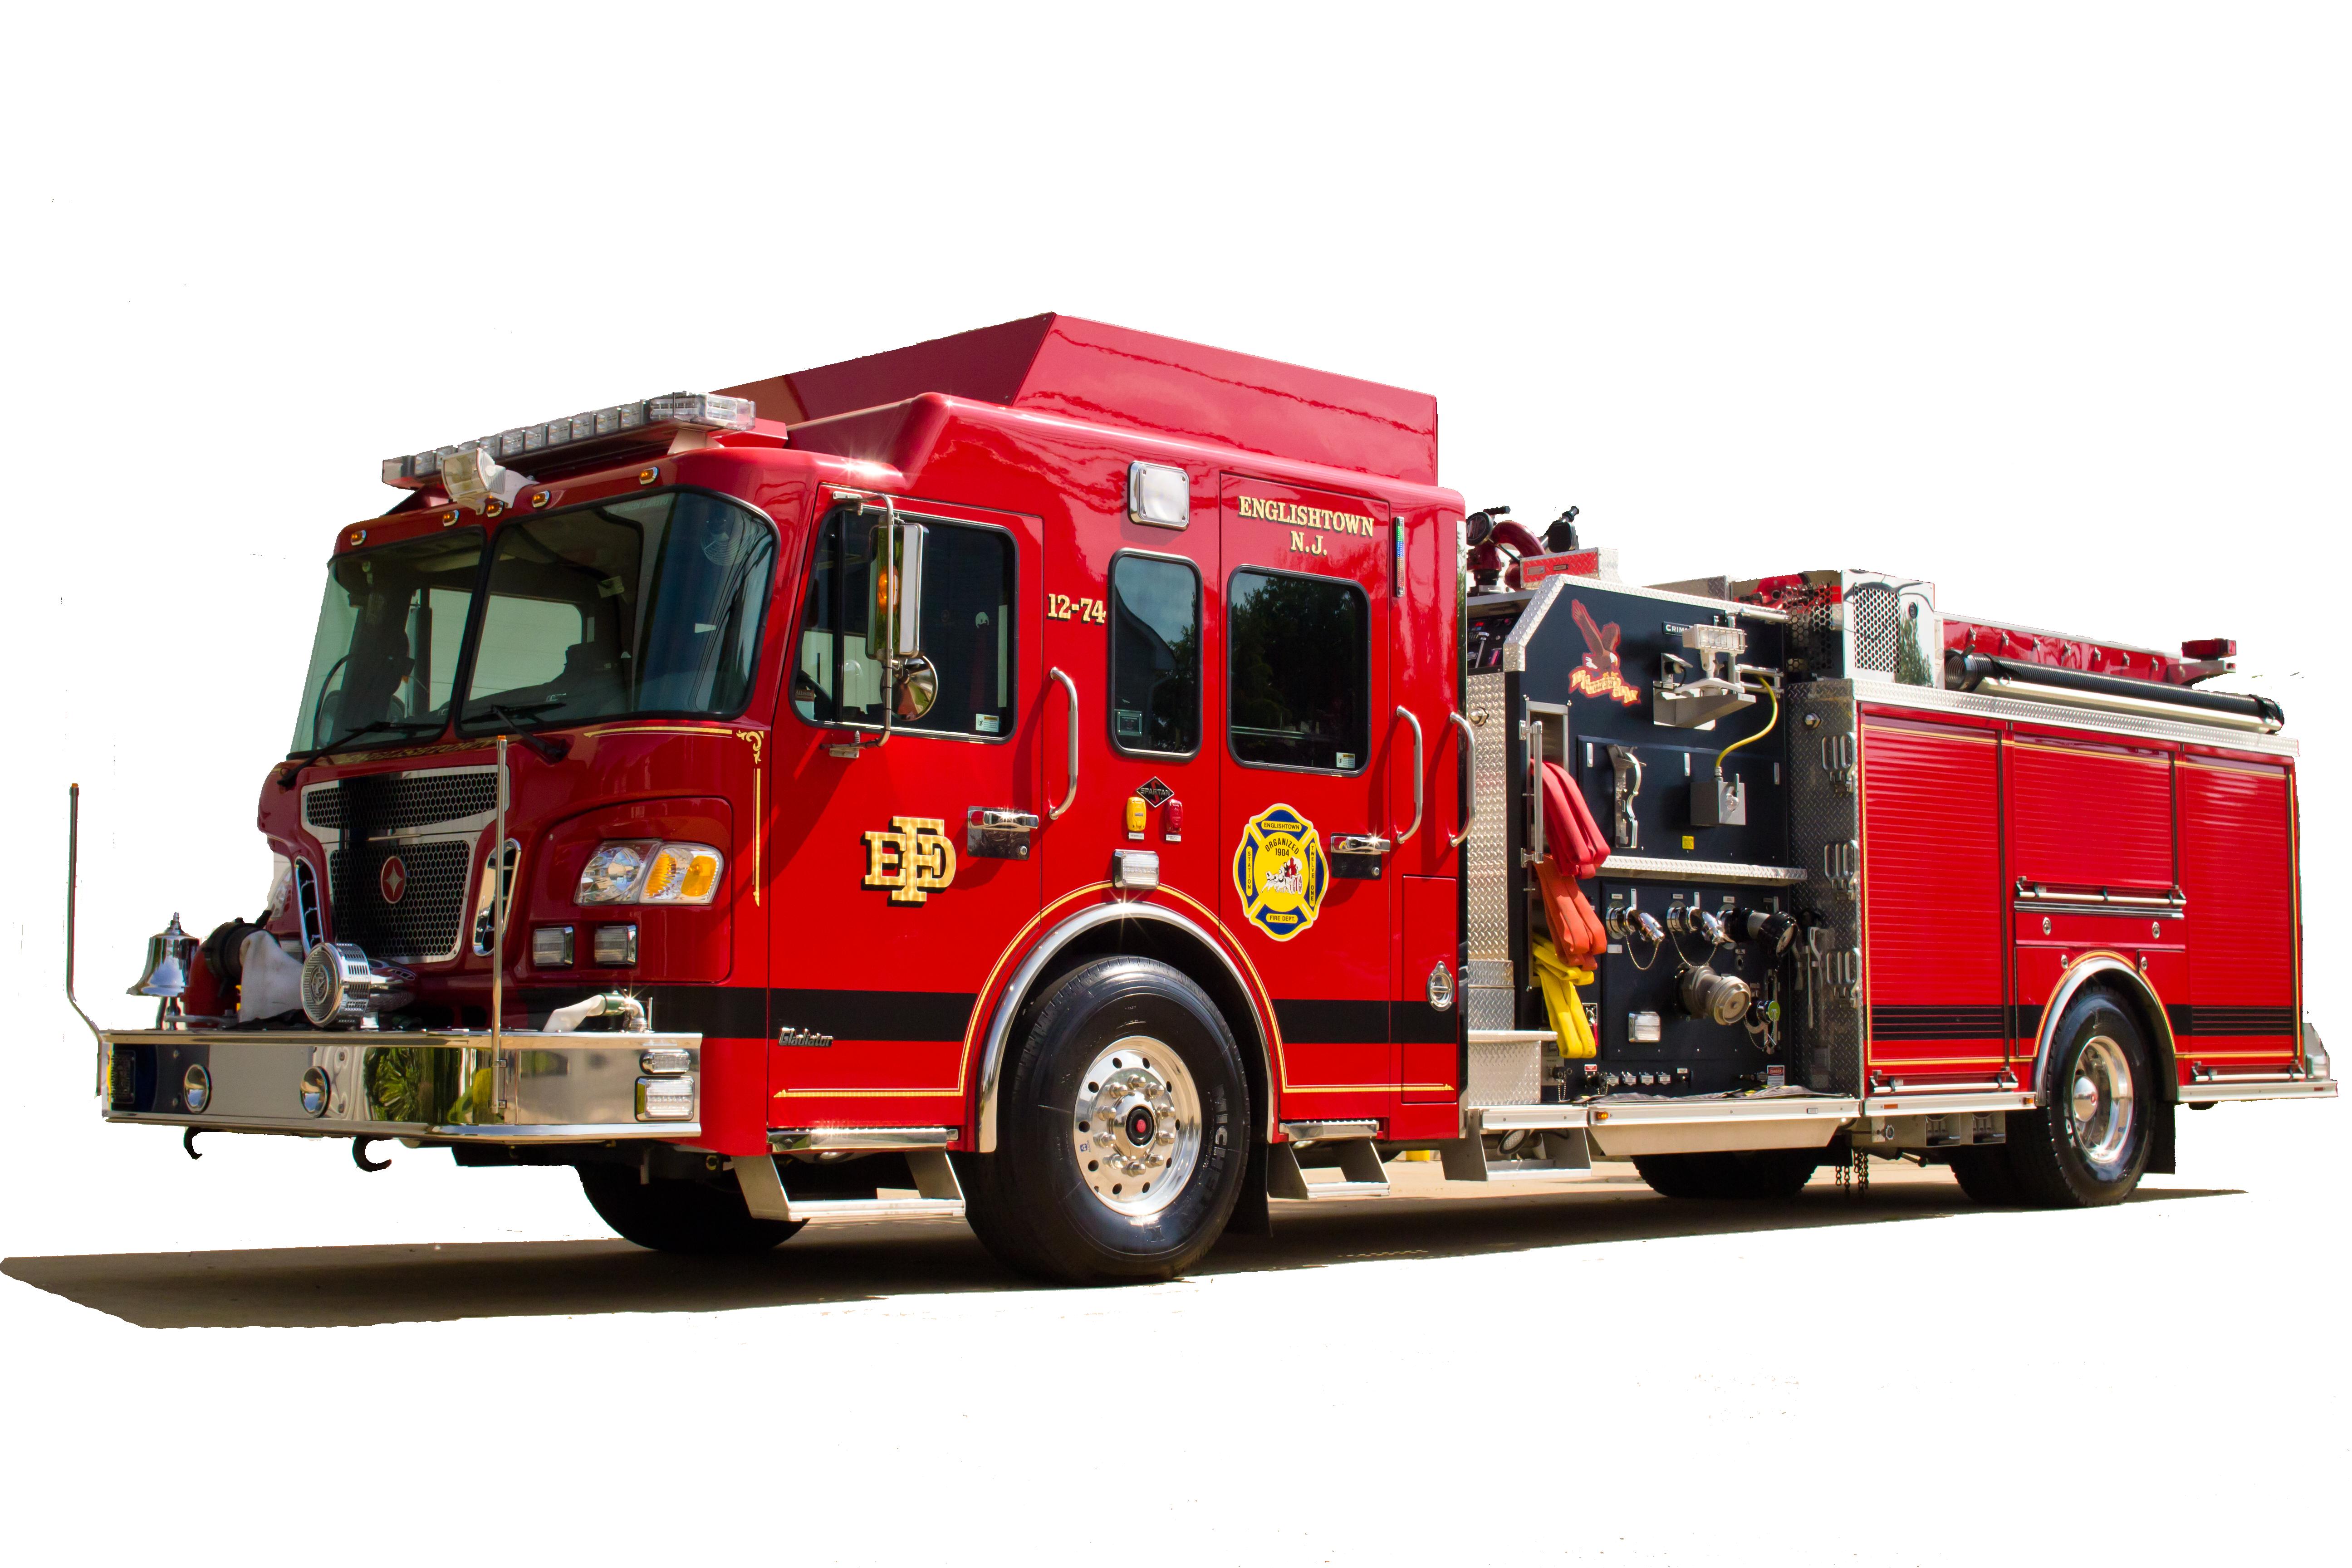 Truck png images free. Firetruck clipart van fire